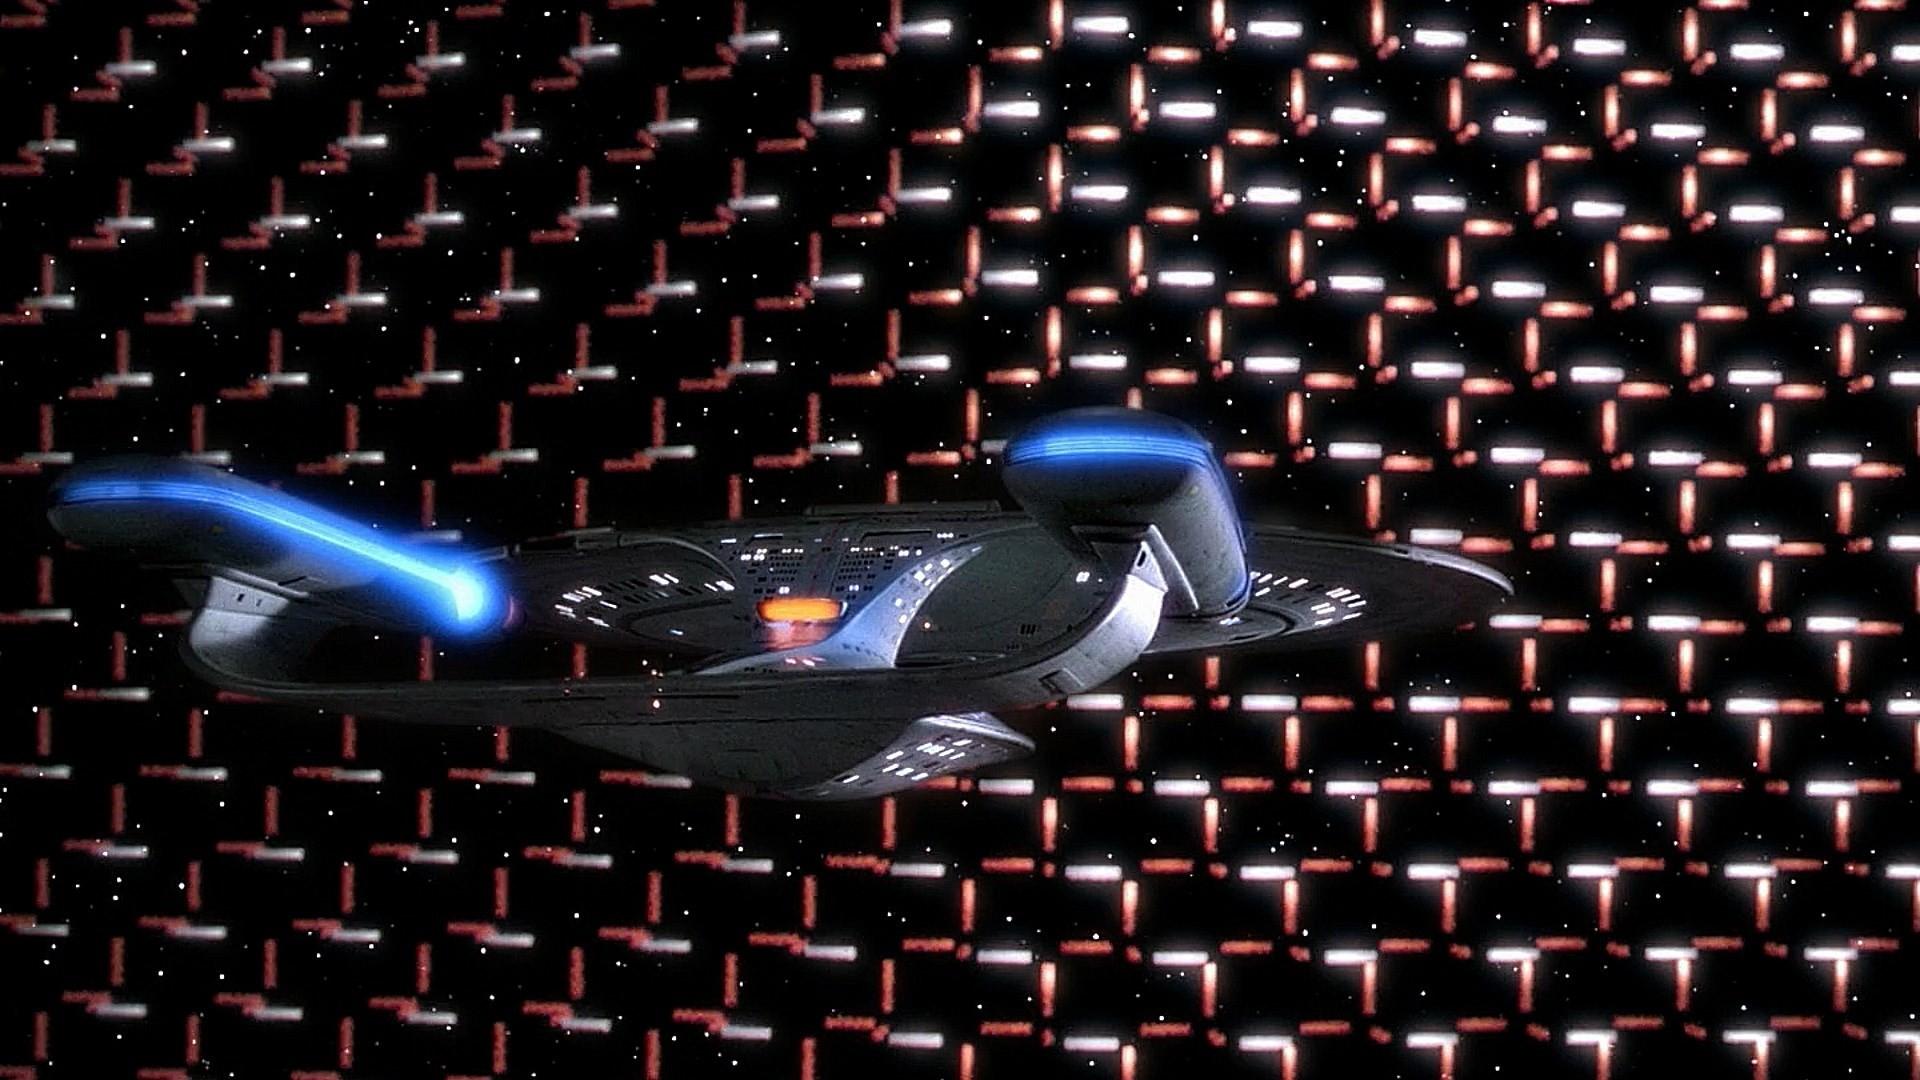 Picture for Desktop: star trek the next generation